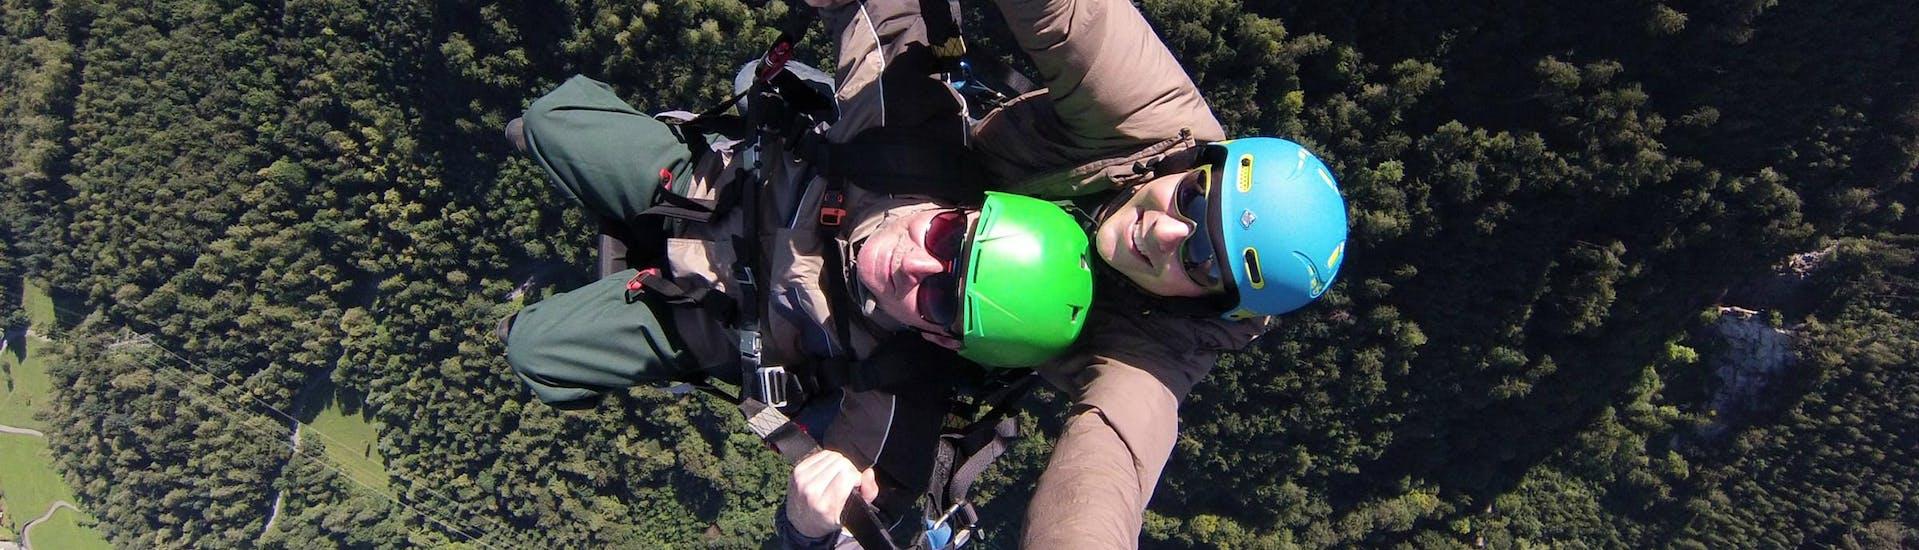 Tandem Paragliding in Glarnerland & Walensee - Flight Day